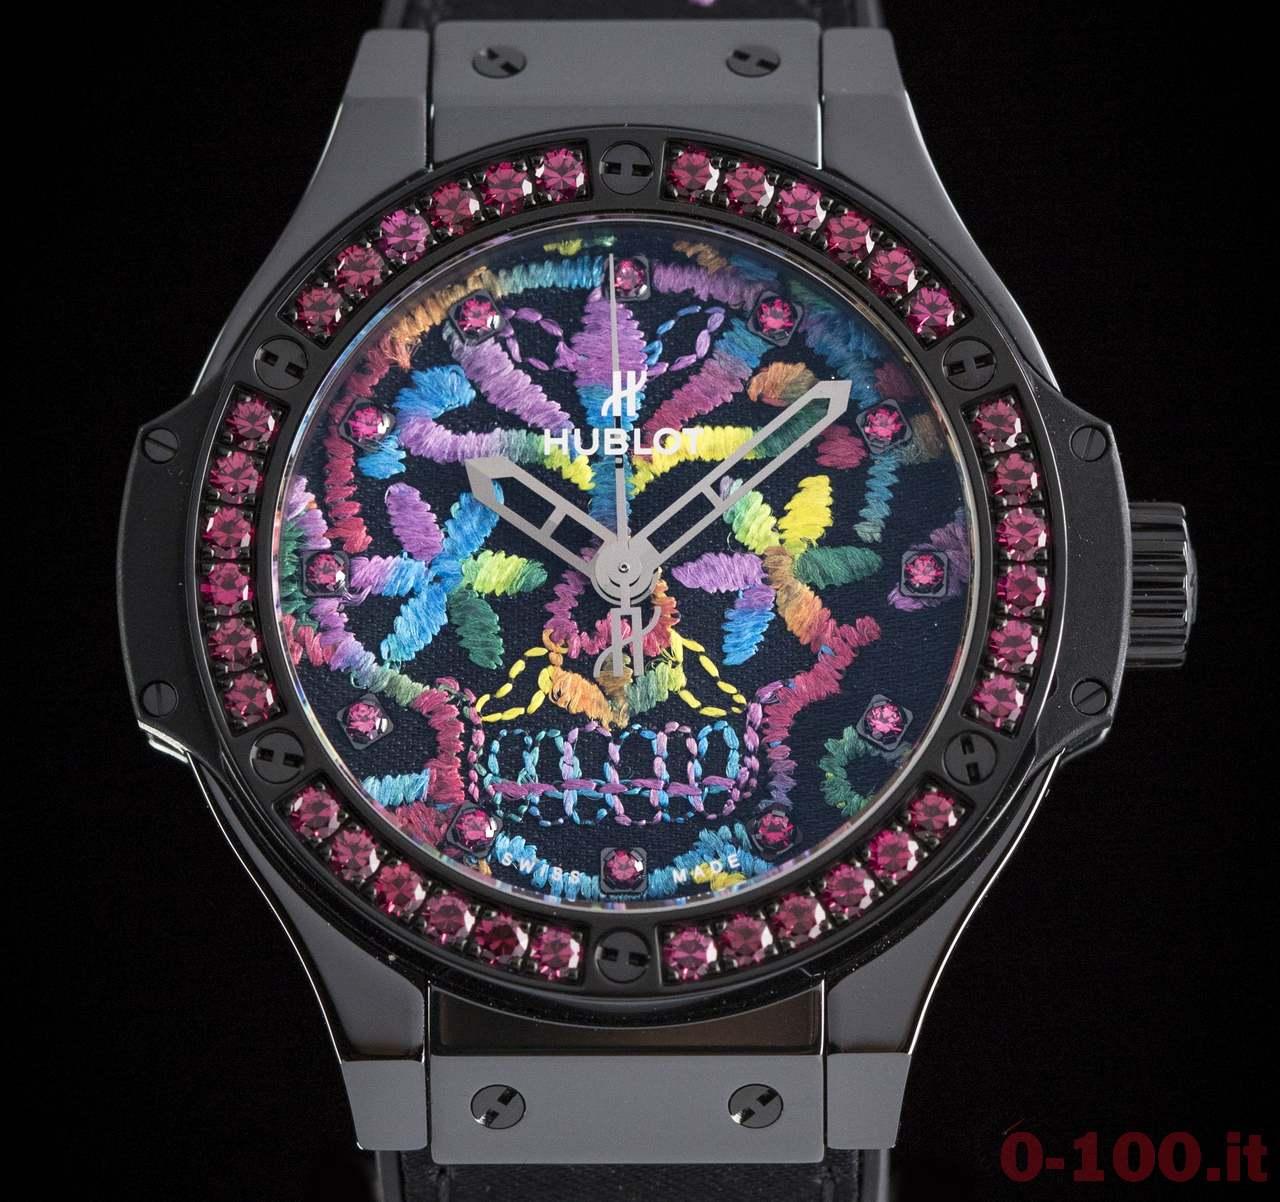 hublot-big-bang-broderie-sugar-skull-limited-edition-ref-343-cs-6599-nr-1213_0-1002